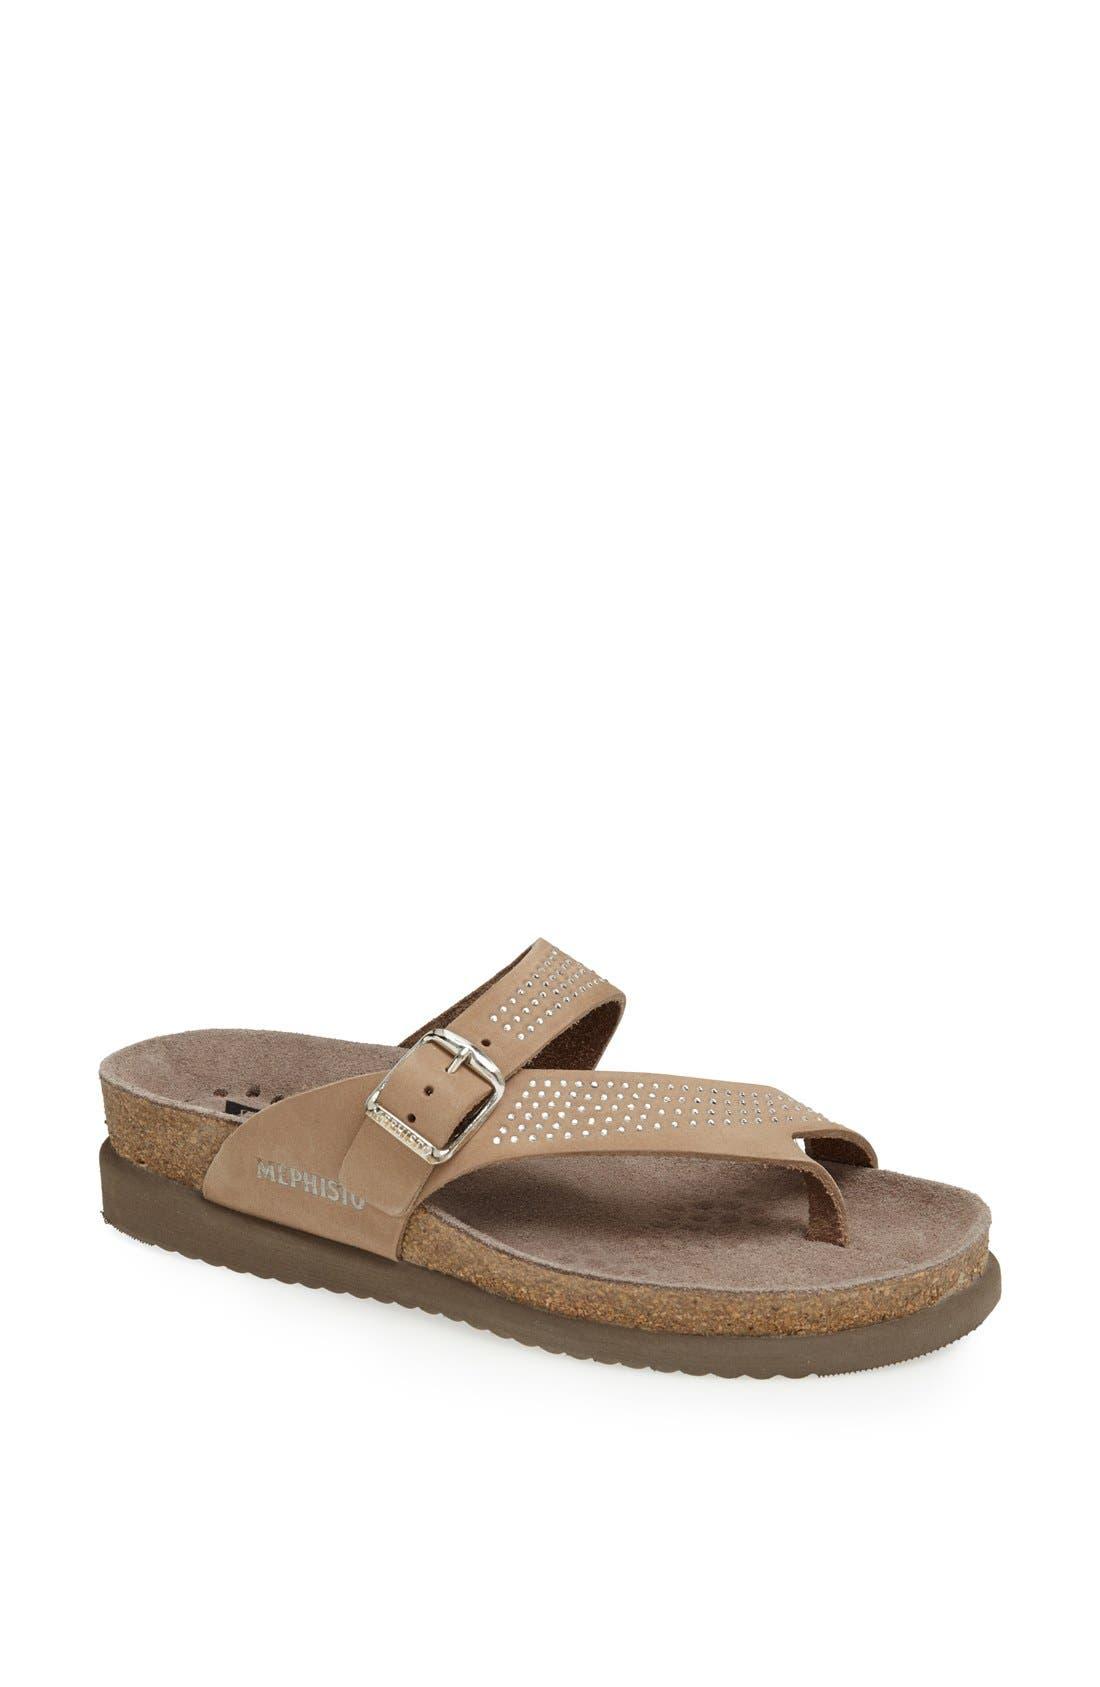 Alternate Image 1 Selected - Mephisto 'Helen - Spark' Leather Sandal